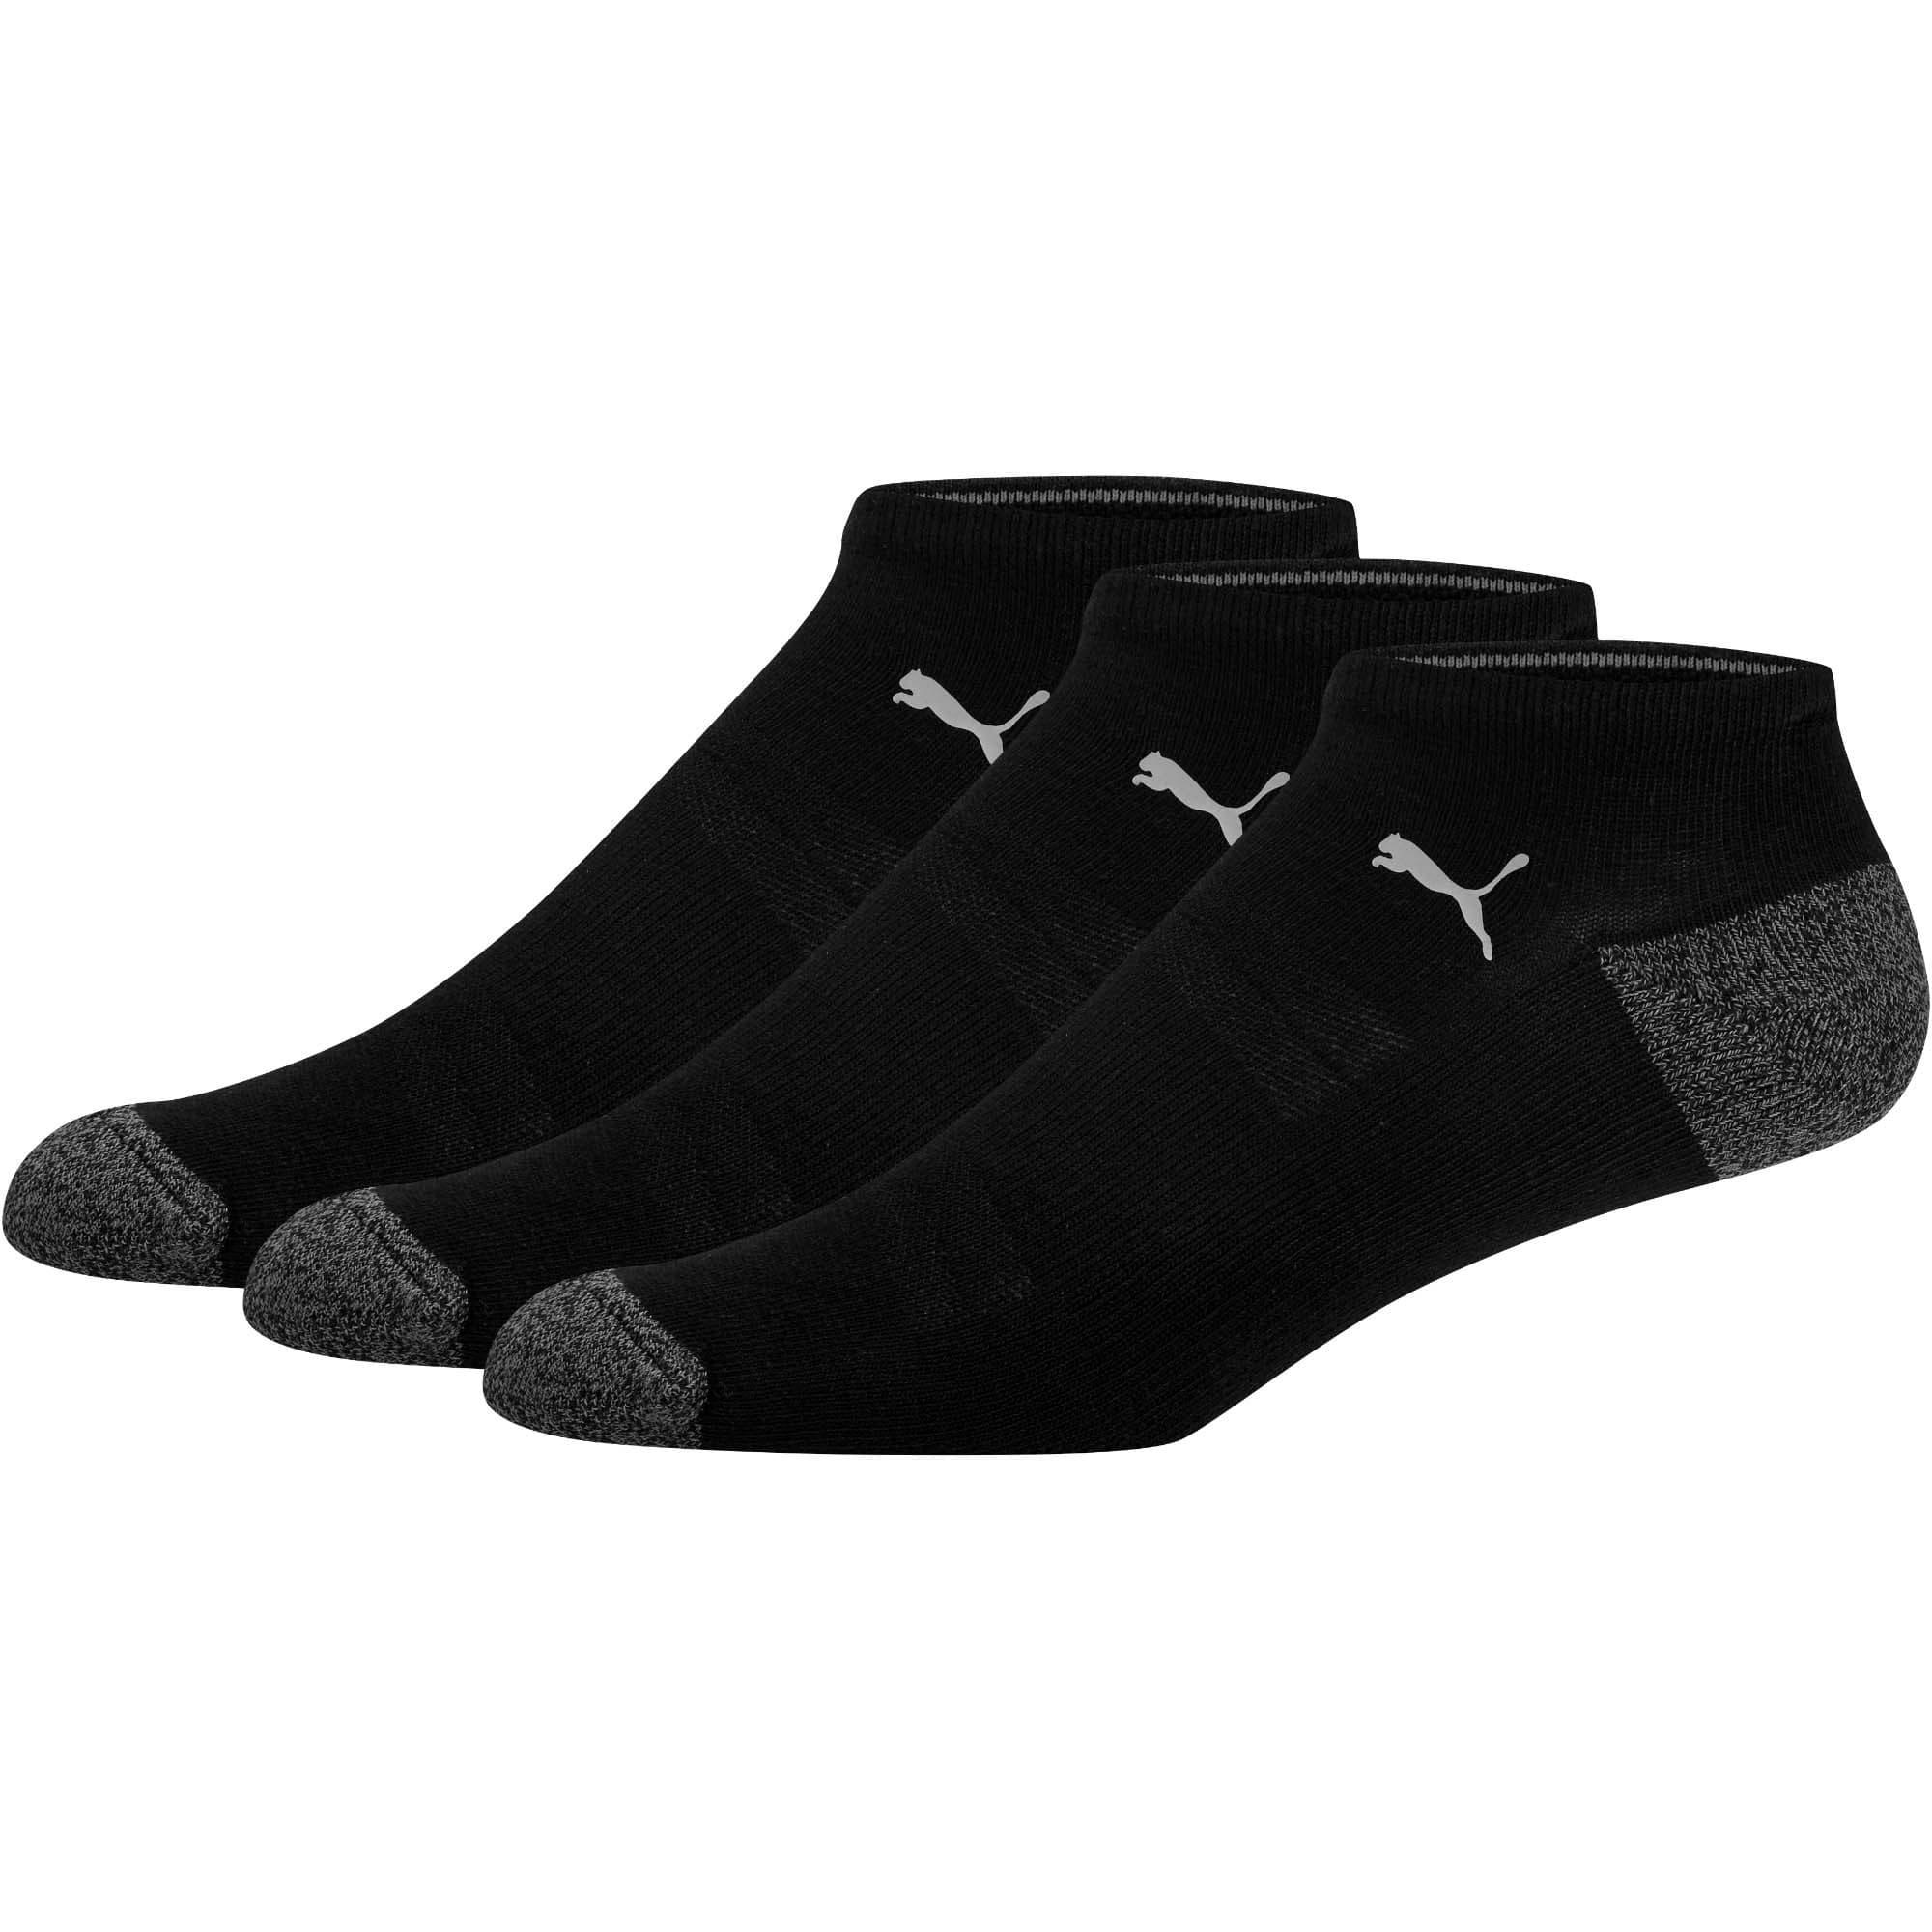 Thumbnail 1 of 1/2 Terry Men's No Show Socks [3 Pack], BLACK / GREY, medium